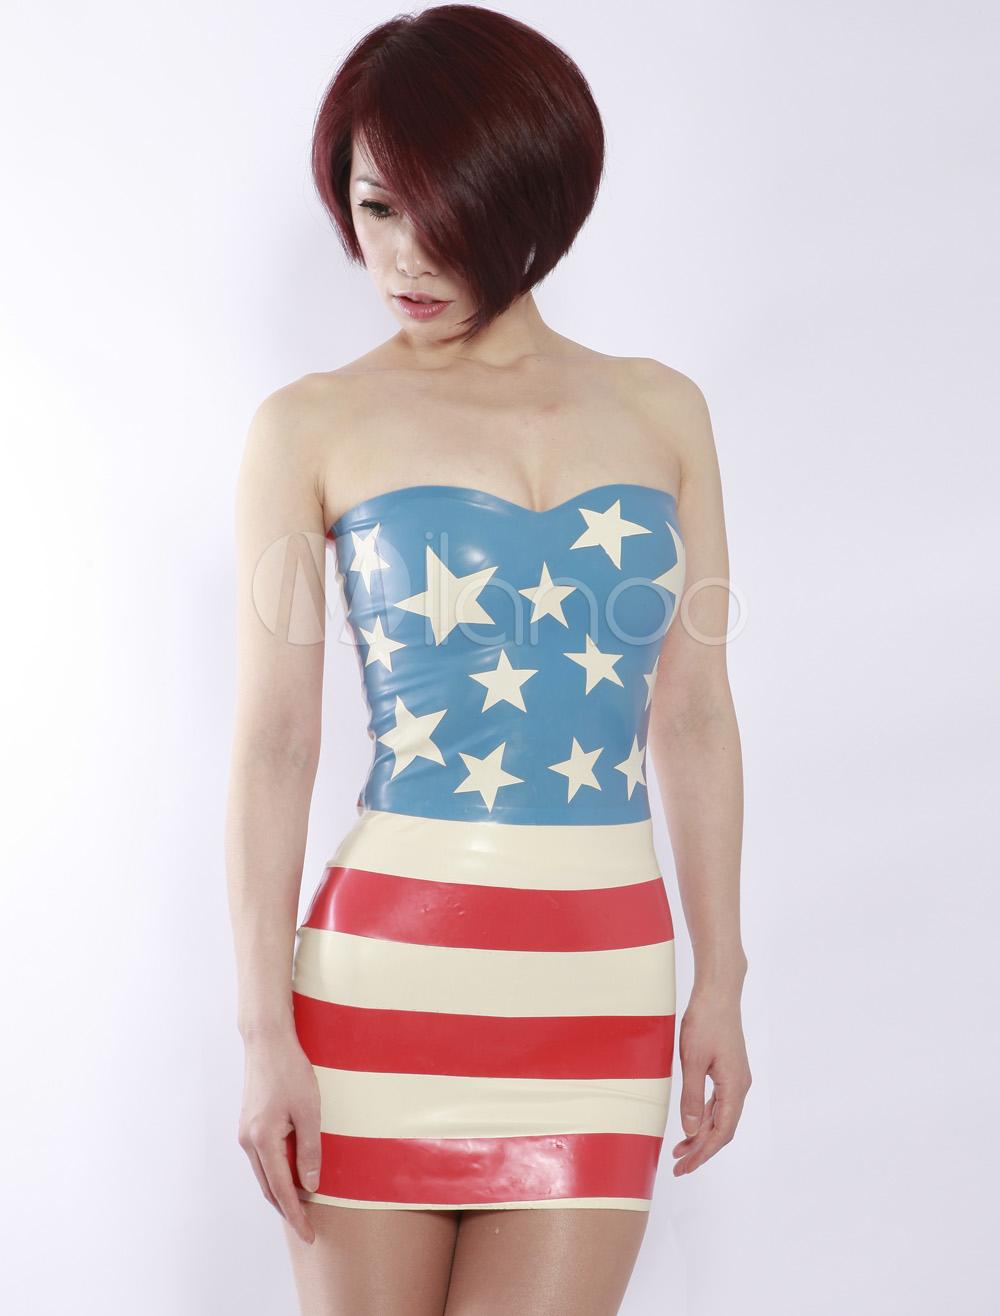 Halloween Stars And Stripes Sweetheart Women's Latex Dress Halloween